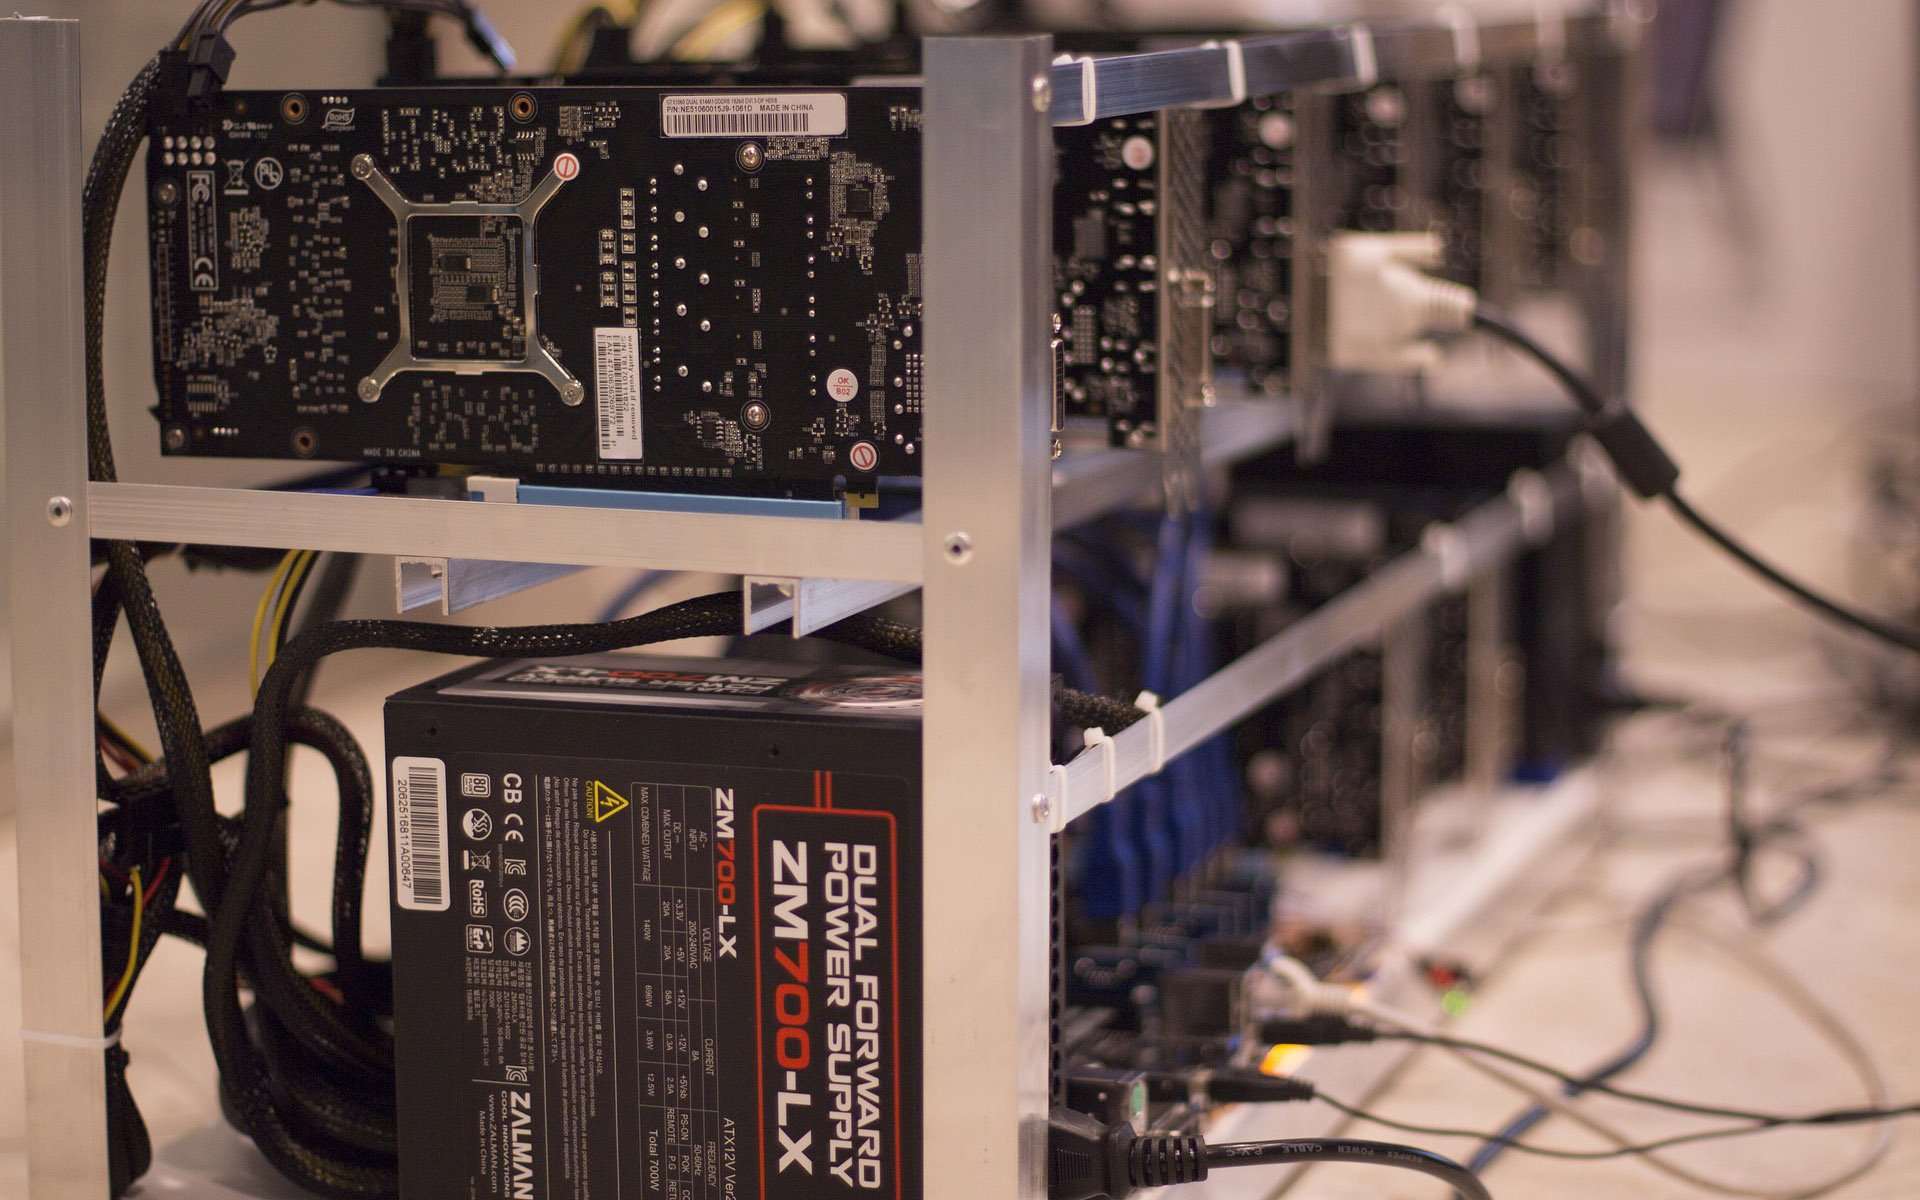 venesuela bitcoin mining legit bitcoin trading app